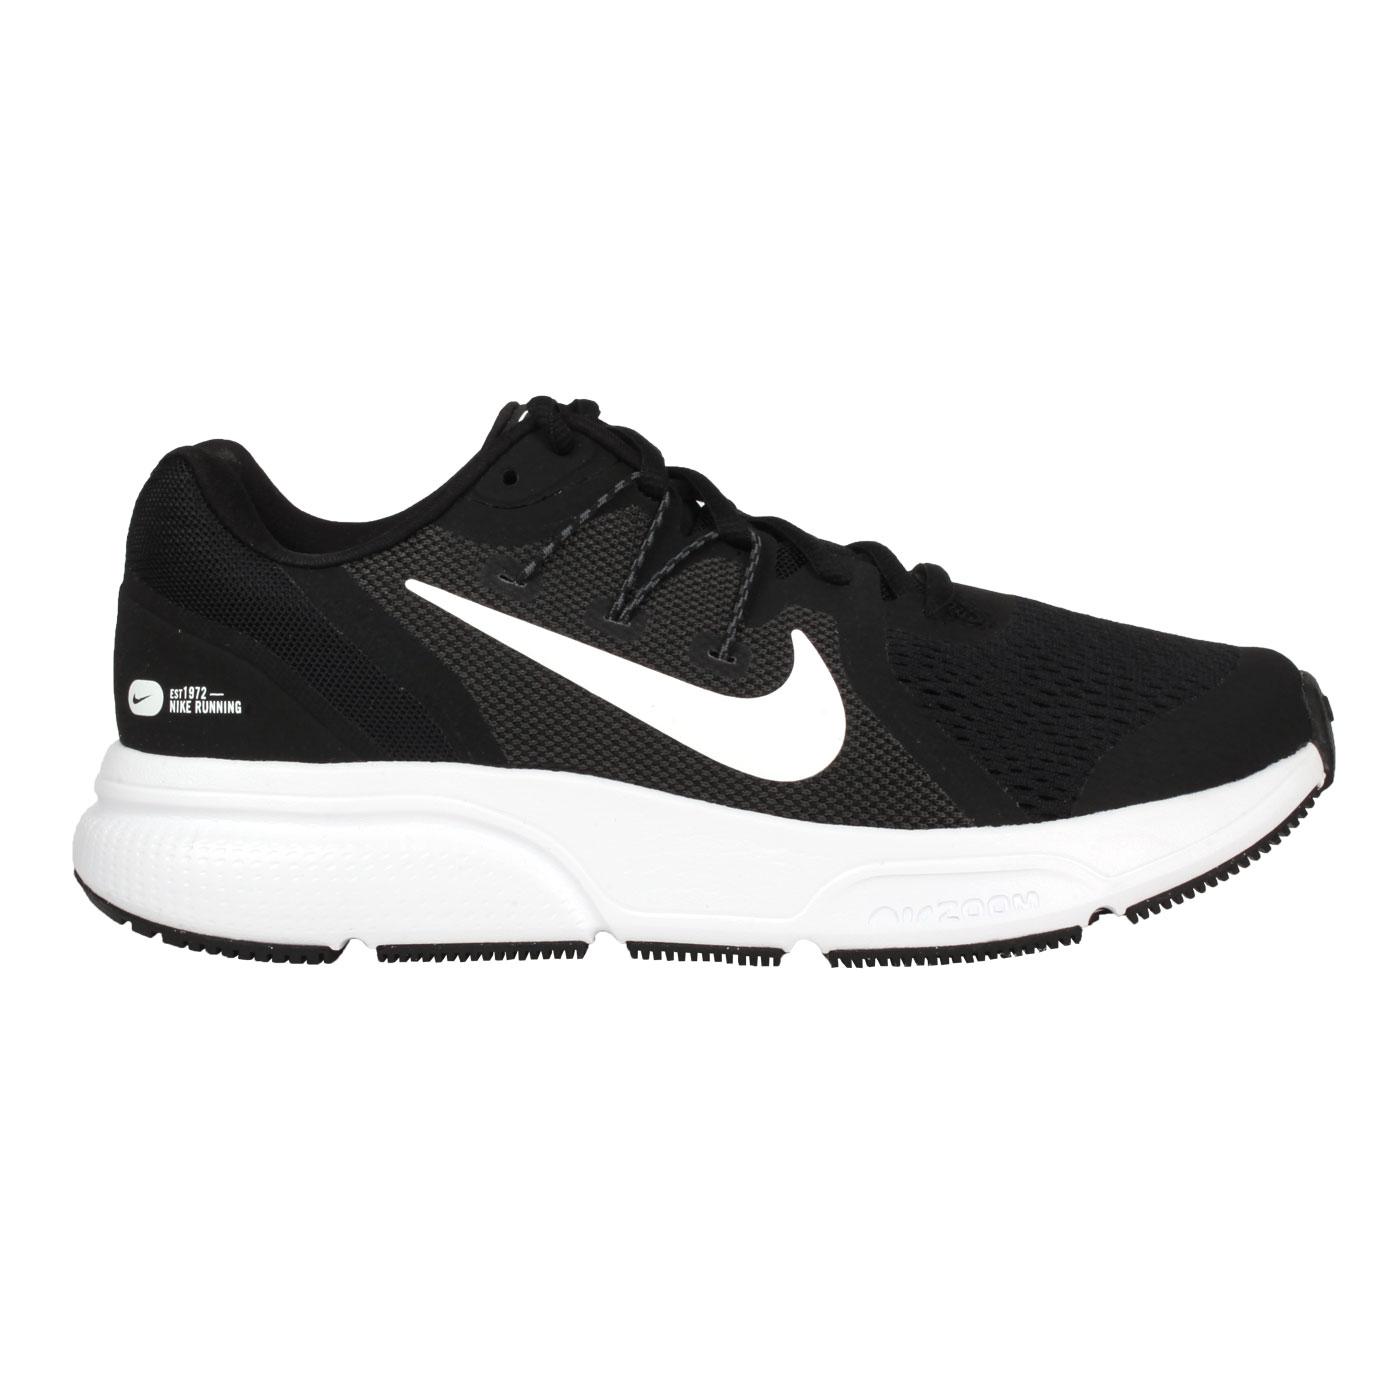 NIKE 女款慢跑鞋  @WMNS ZOOM SPAN 3@CQ9267001 - 黑深灰白